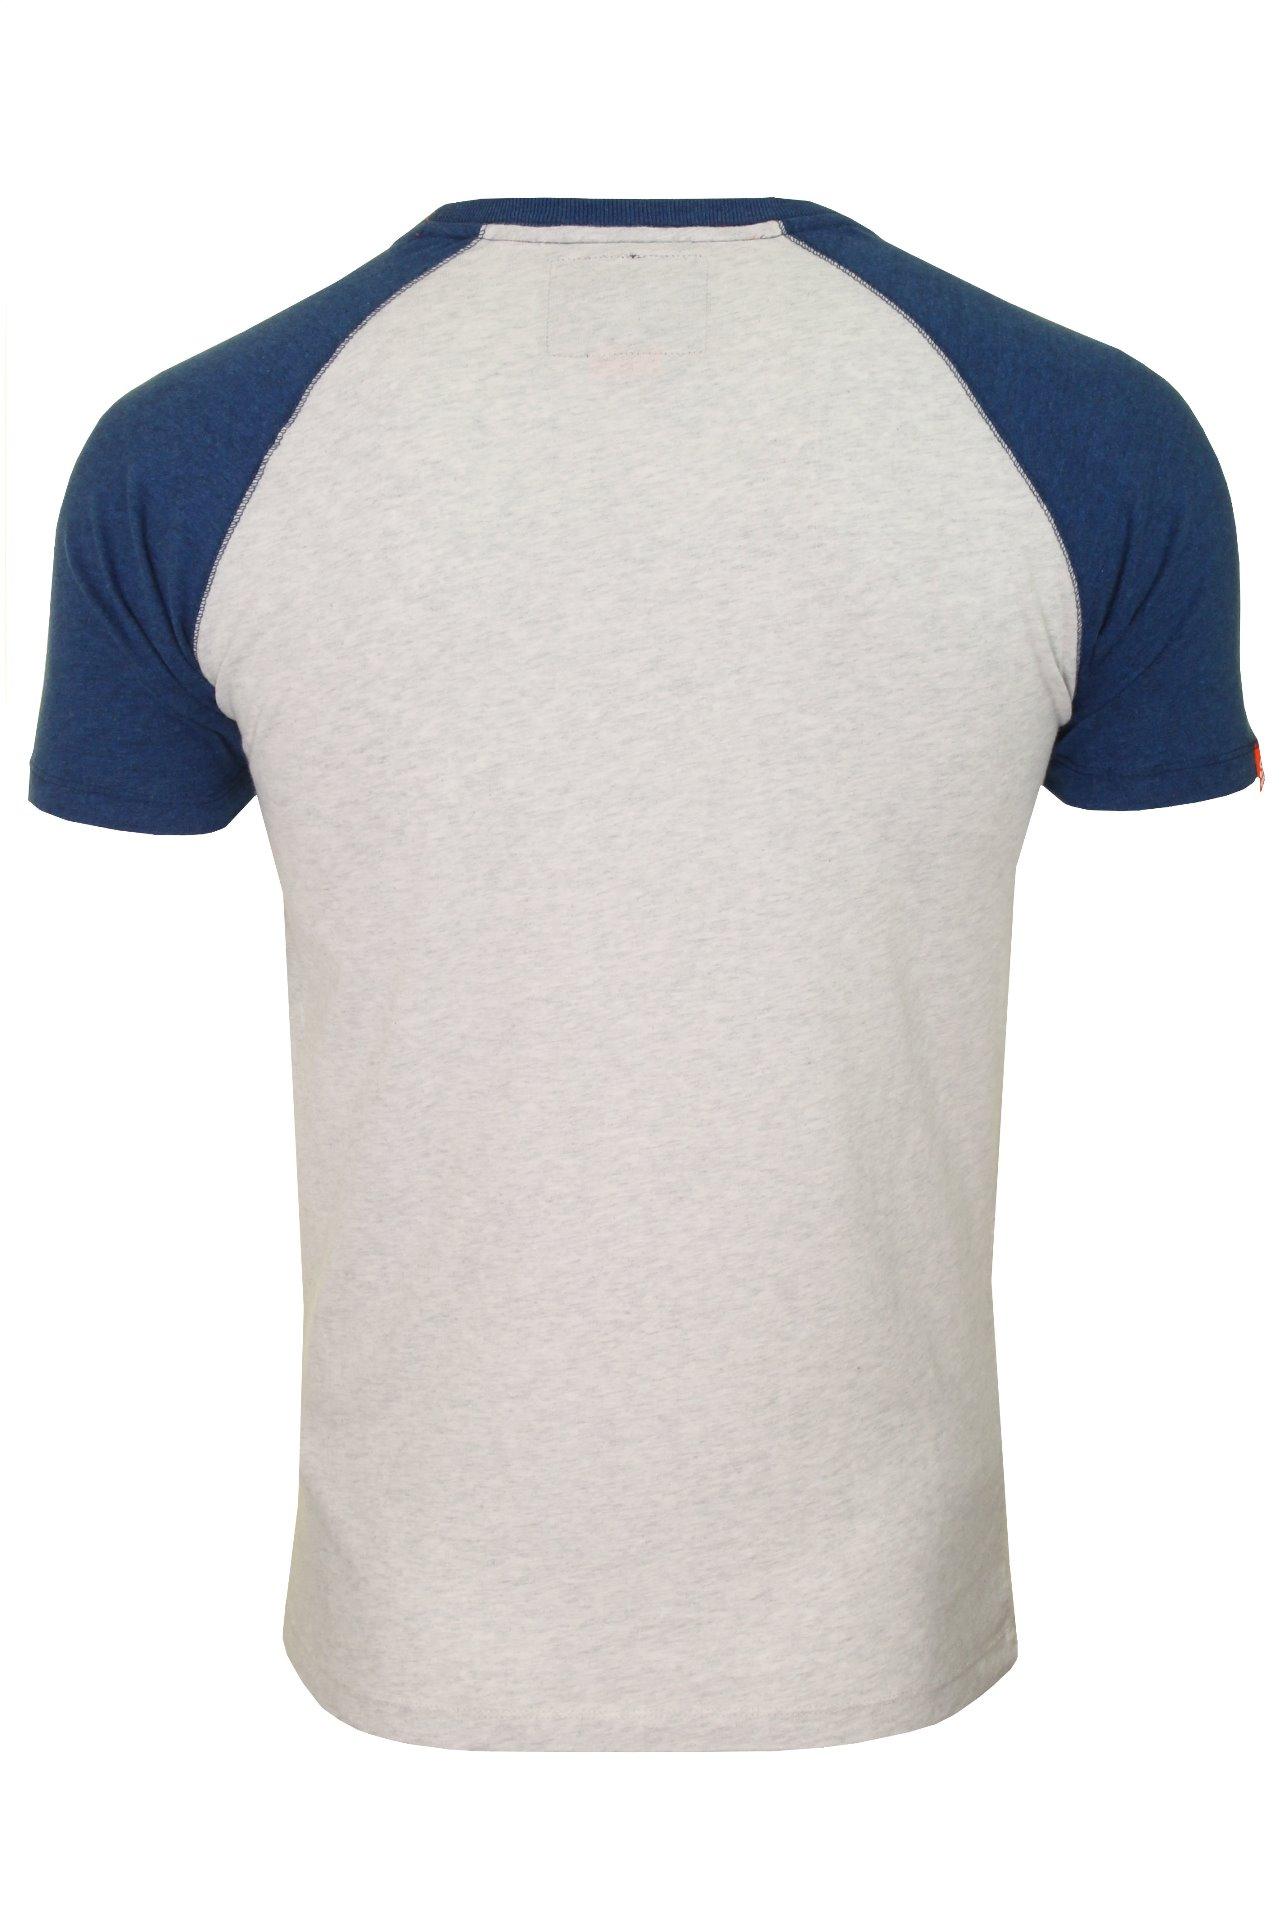 Superdry-Mens-039-Baseball-039-Raglan-Short-Sleeved-T-Shirt thumbnail 5